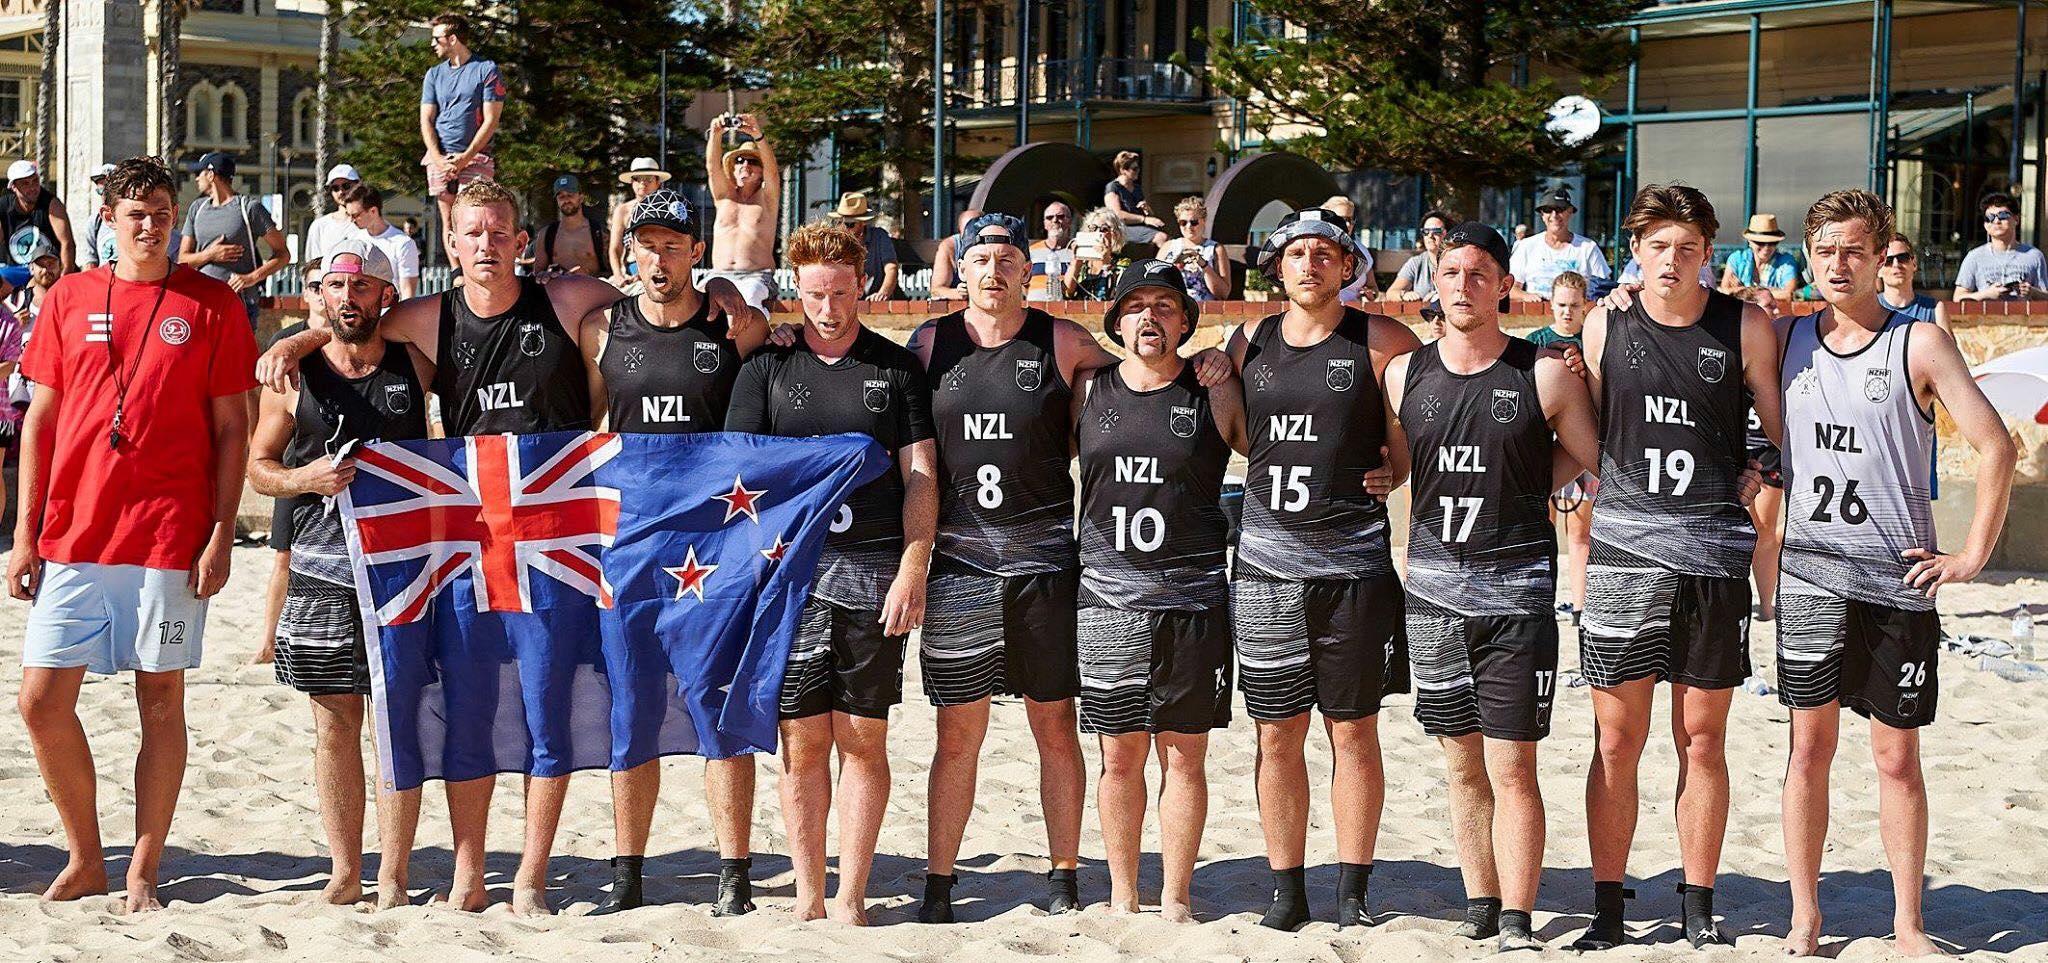 NZ MEN BEACH HANDBALL 2018.jpg